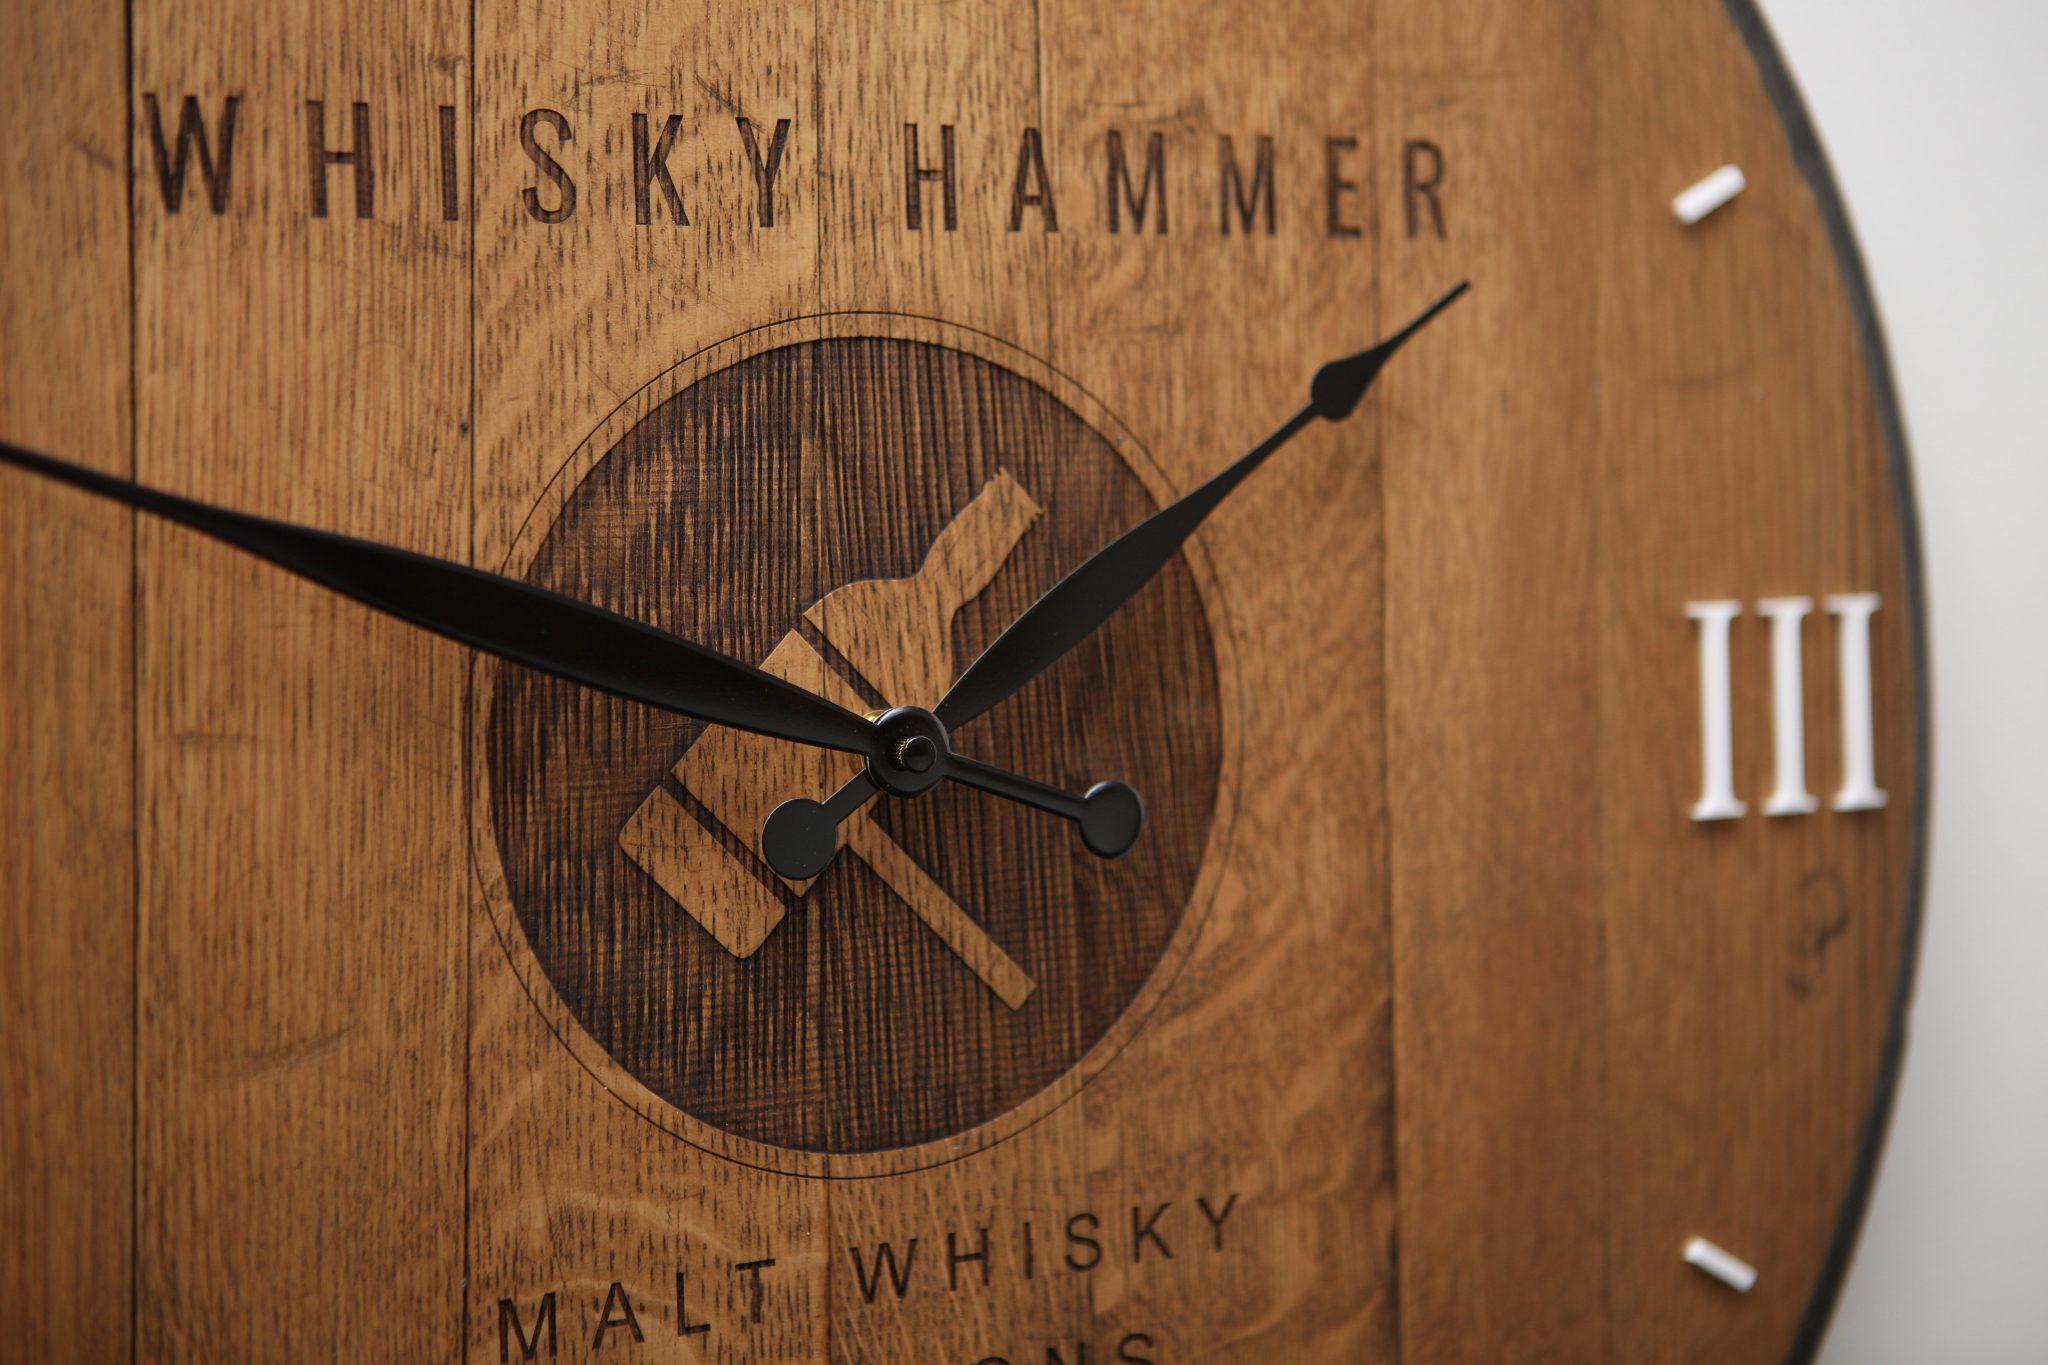 Cask end clock - The Altered State - Whisky Hammer Clock - Laser Engraving